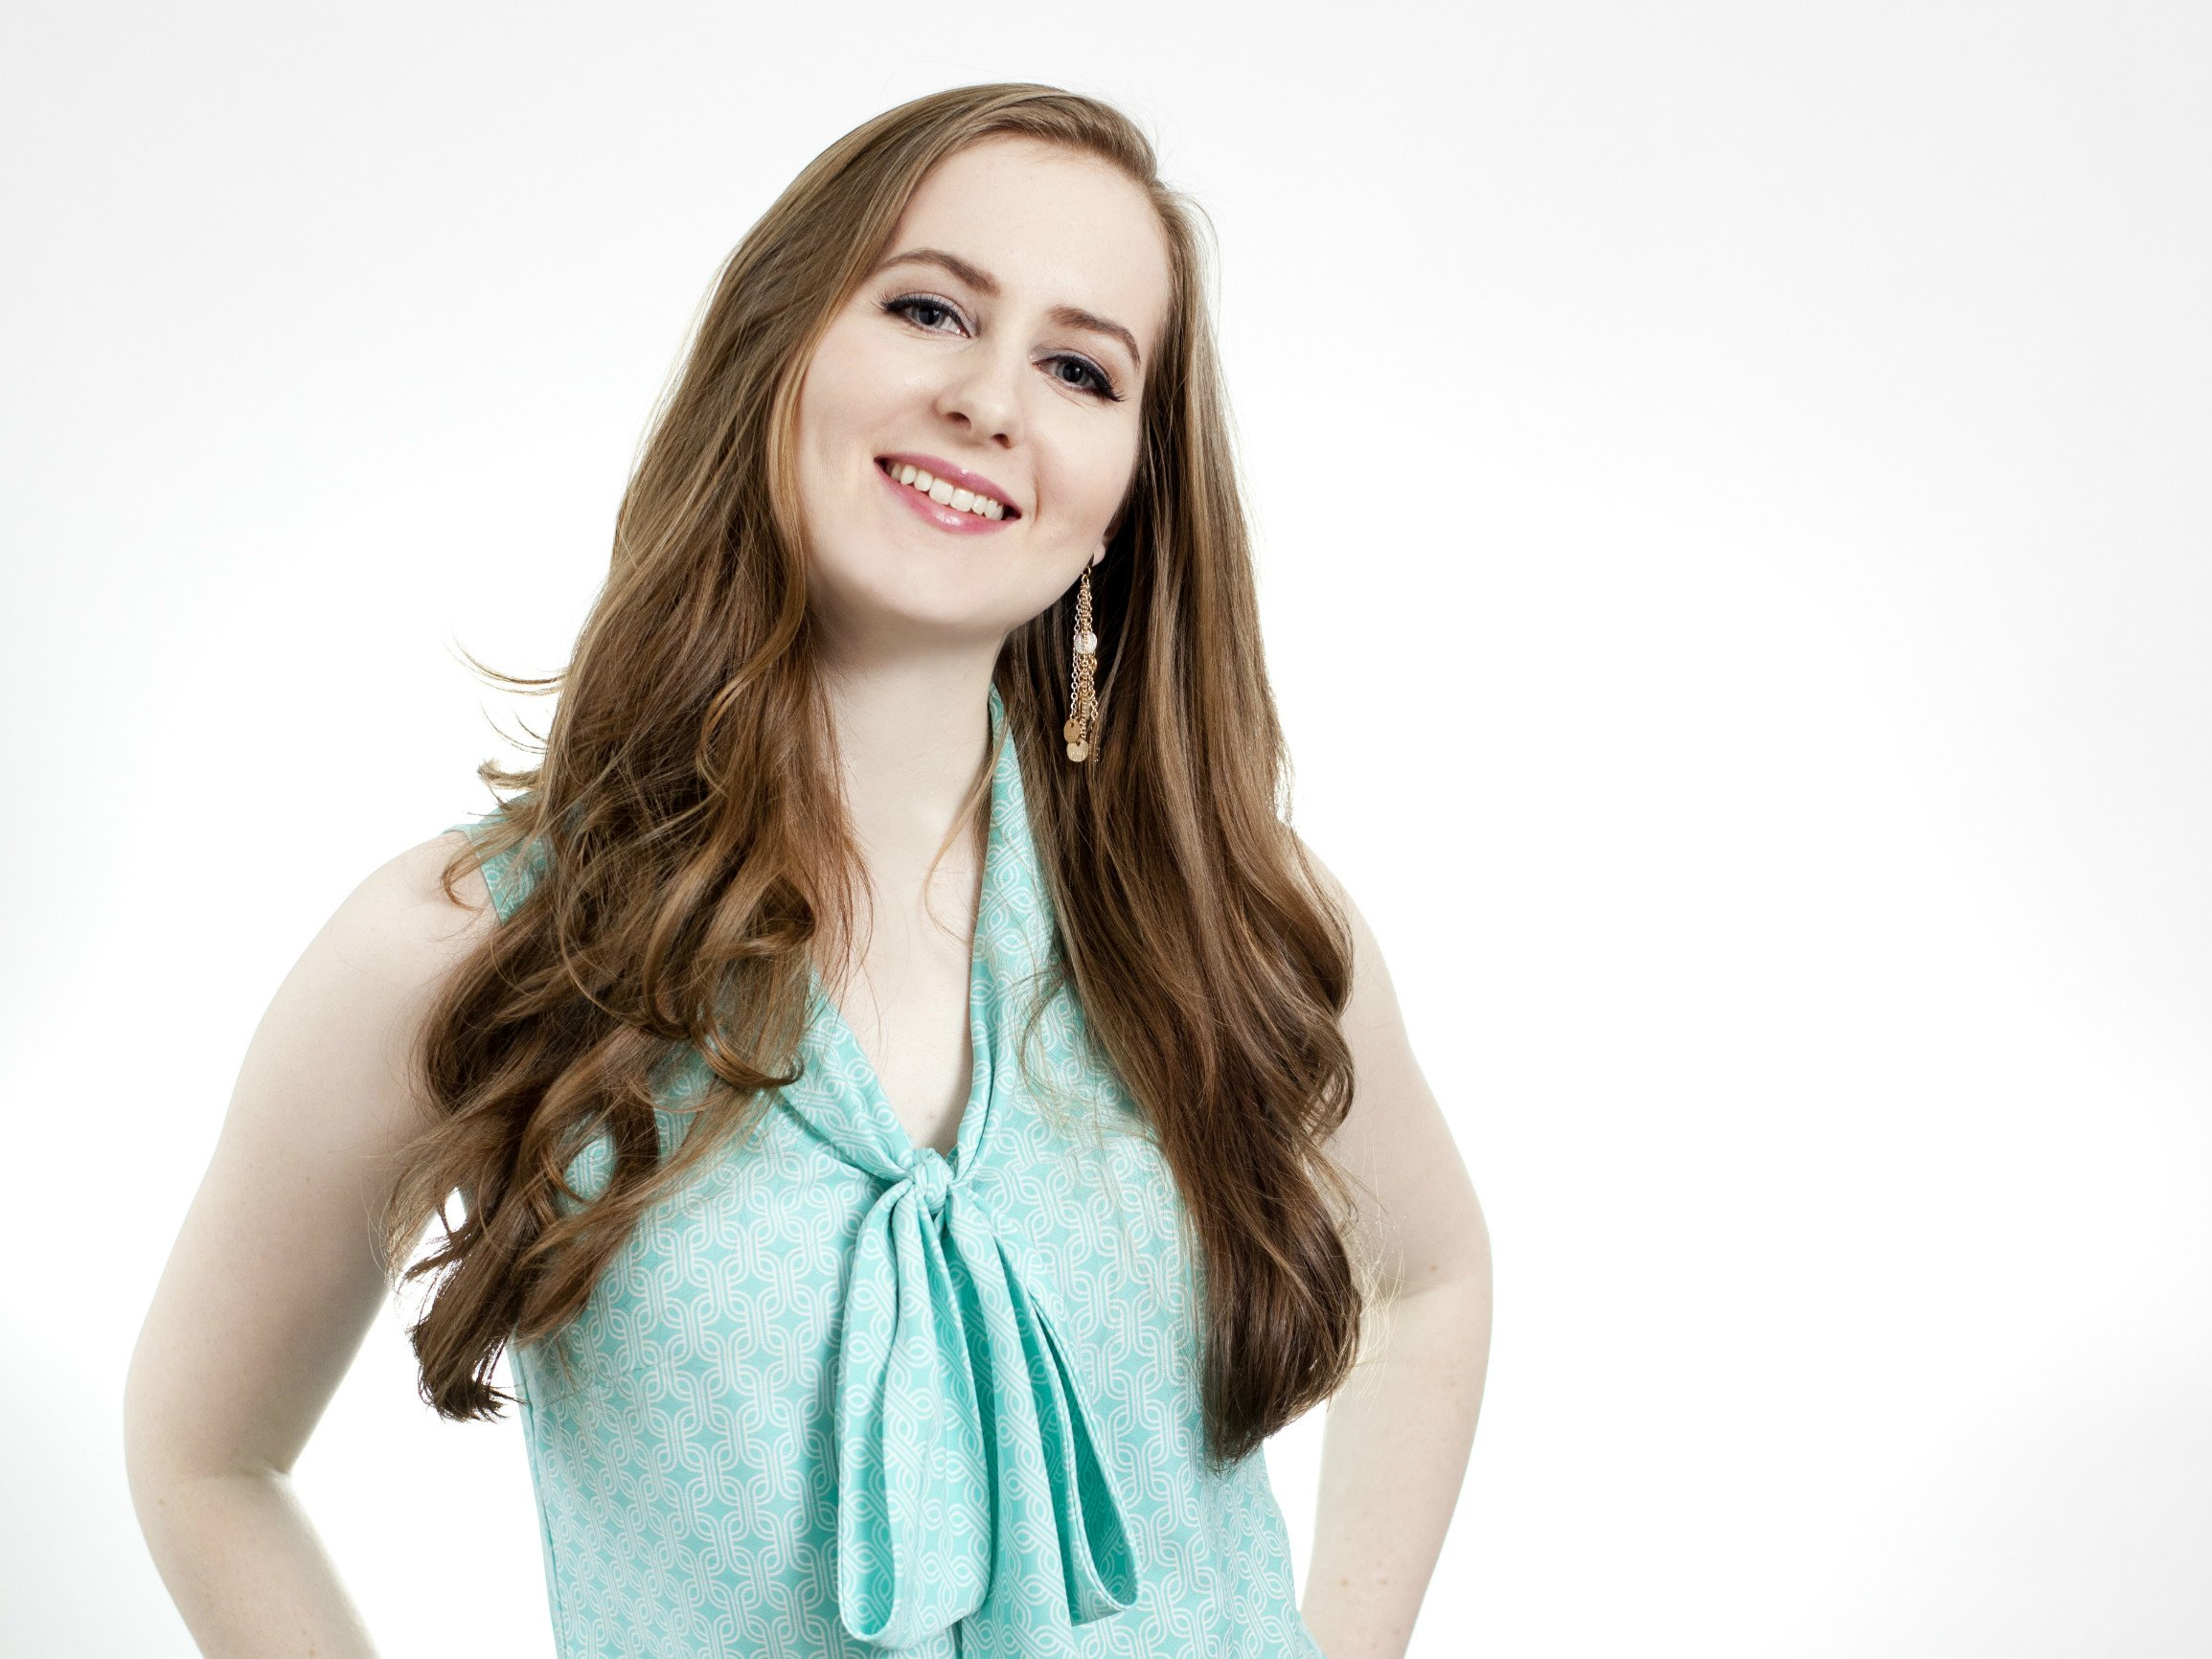 Gillian Perkins